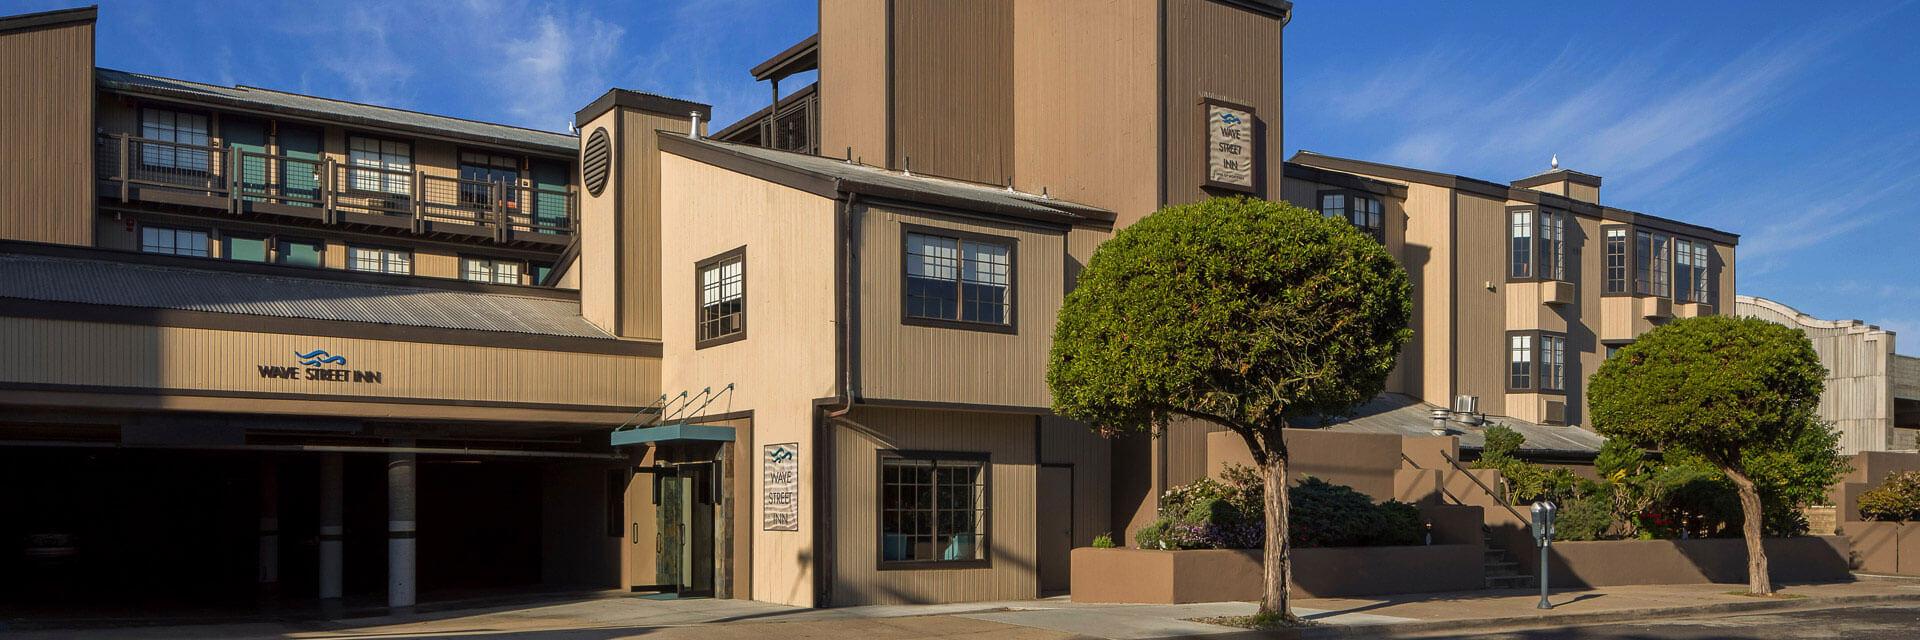 Site Map Of Wave Street Inn Monterey California